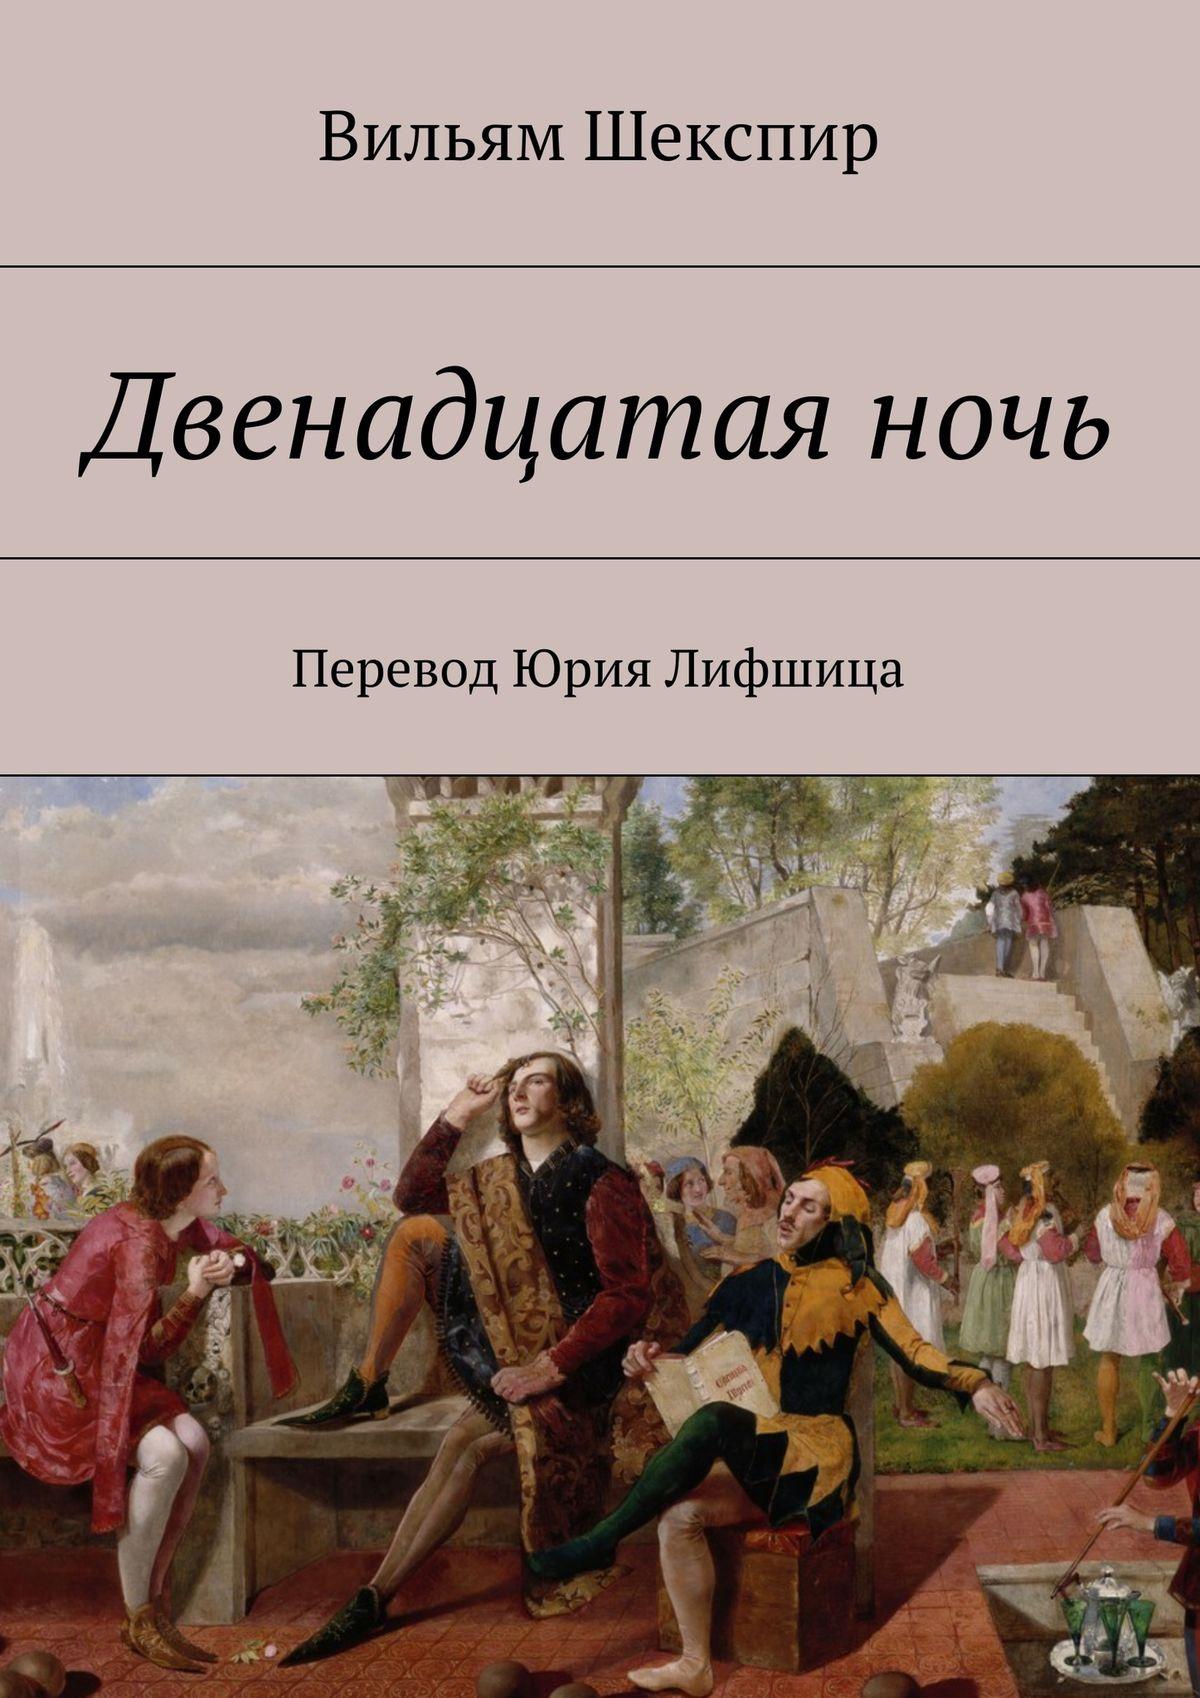 Уильям Шекспир Двенадцатаяночь. Перевод Юрия Лифшица шекспир у двенадцатая ночь